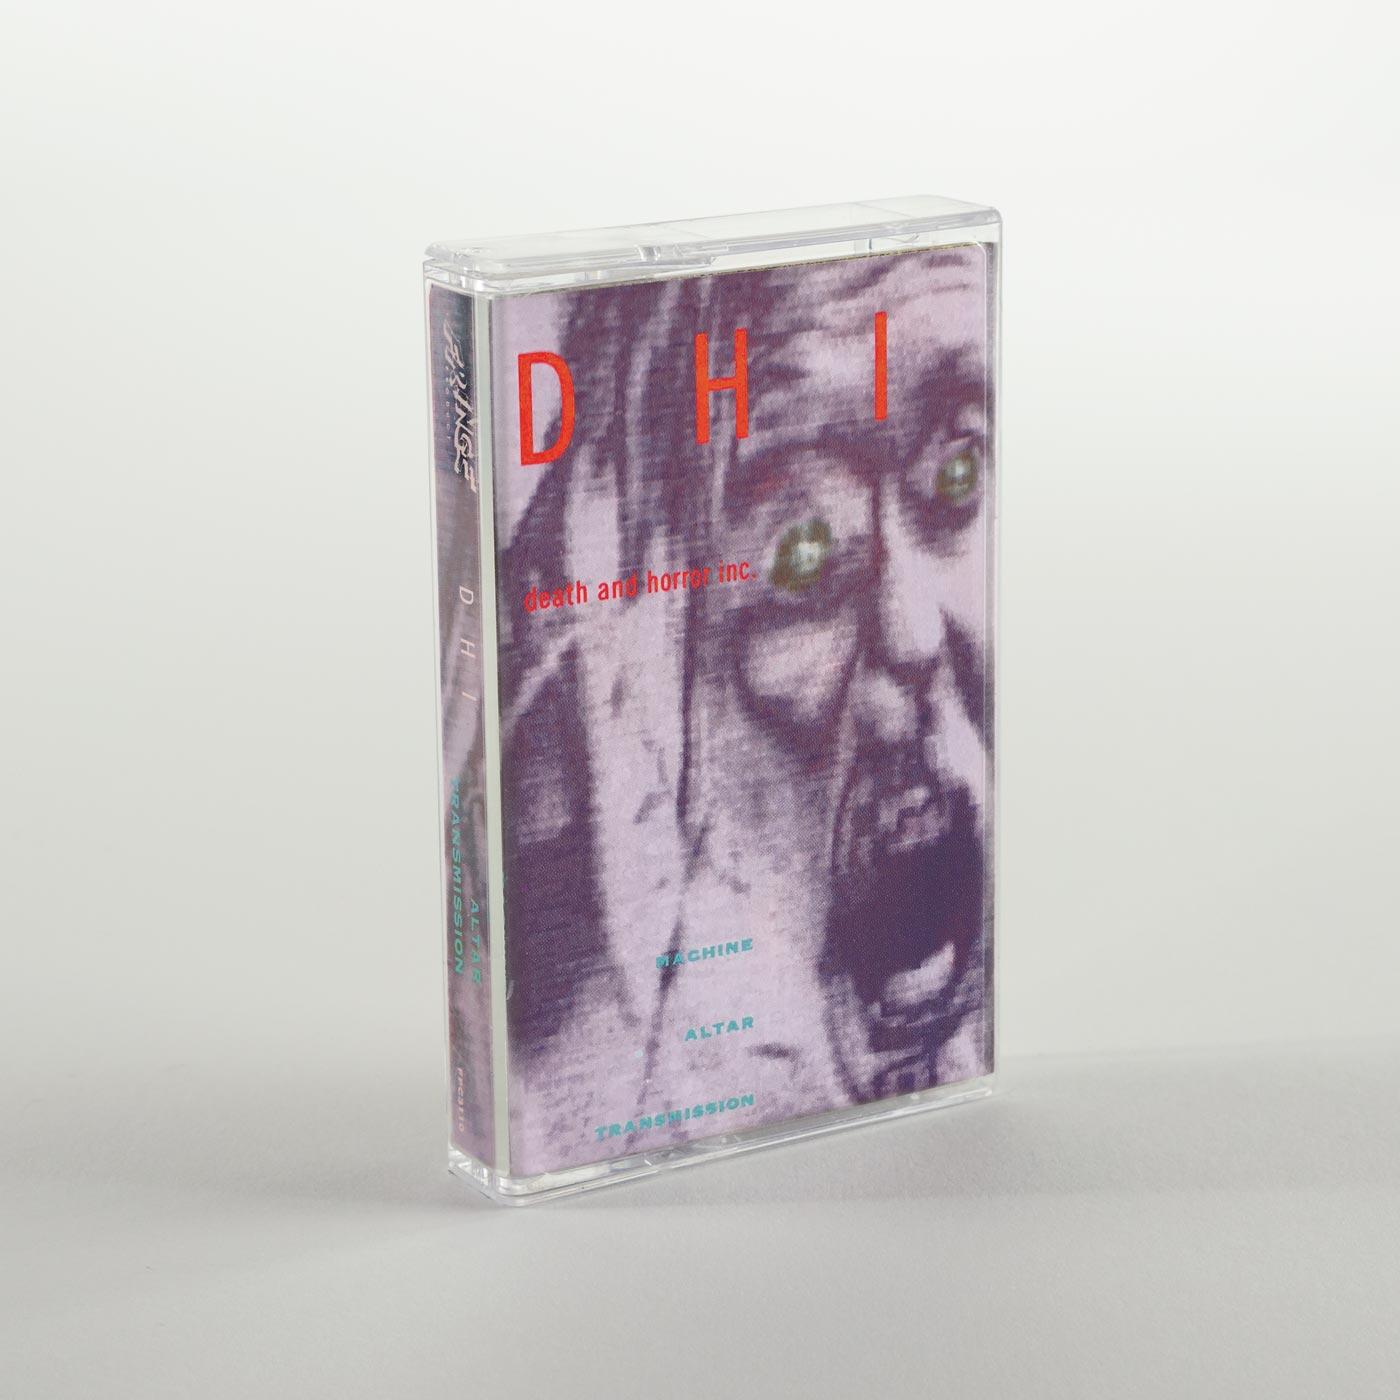 DHI (death and horror inc) Machine Altar Transmission cassette case